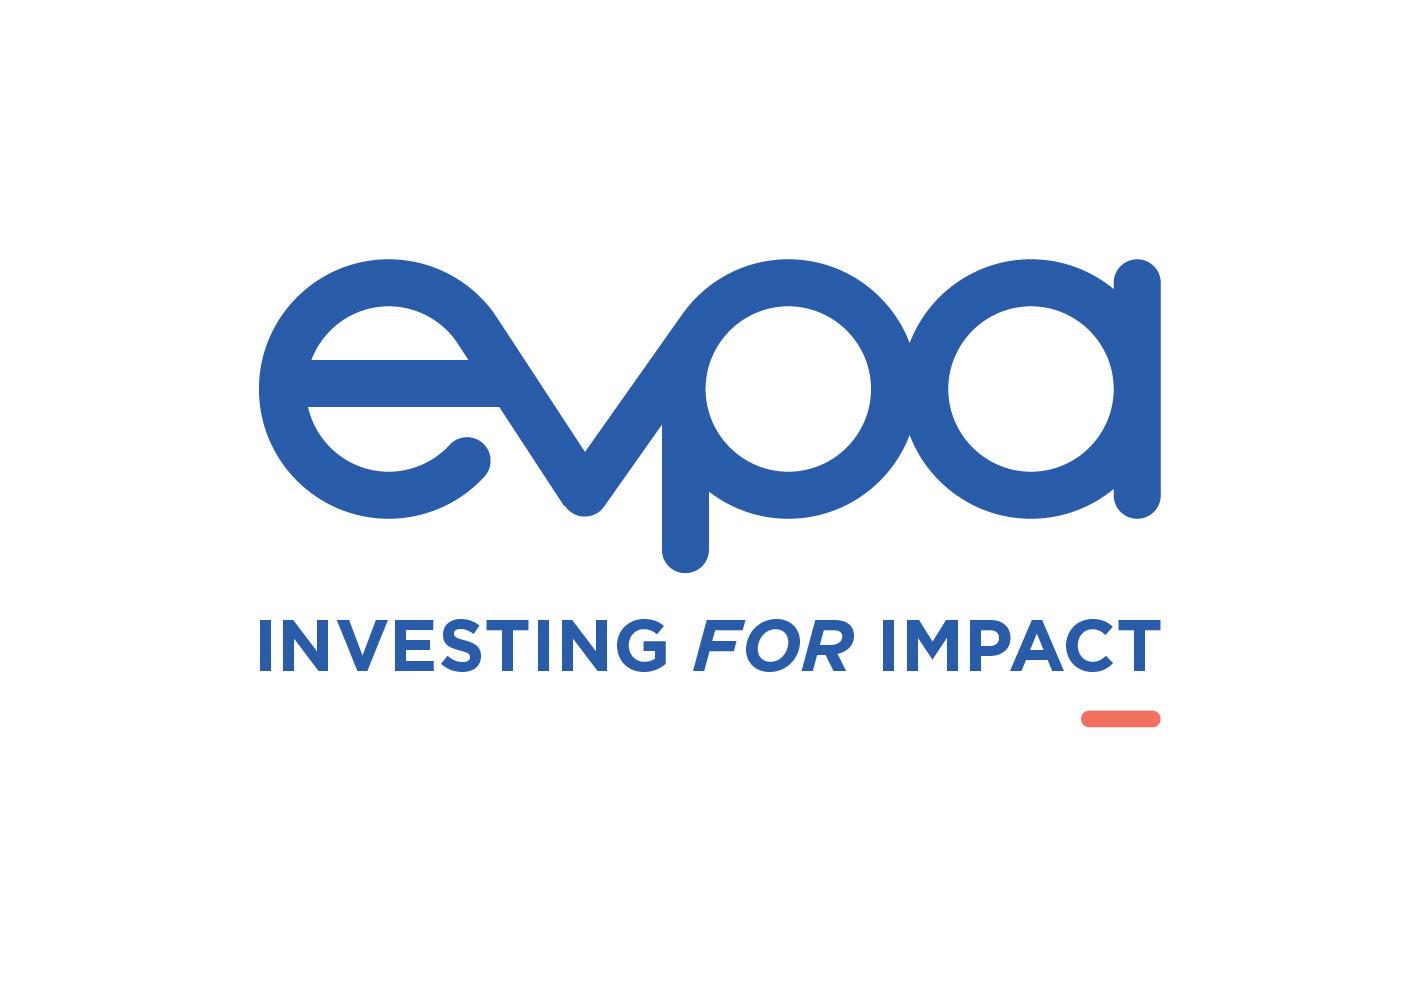 EVPA logo